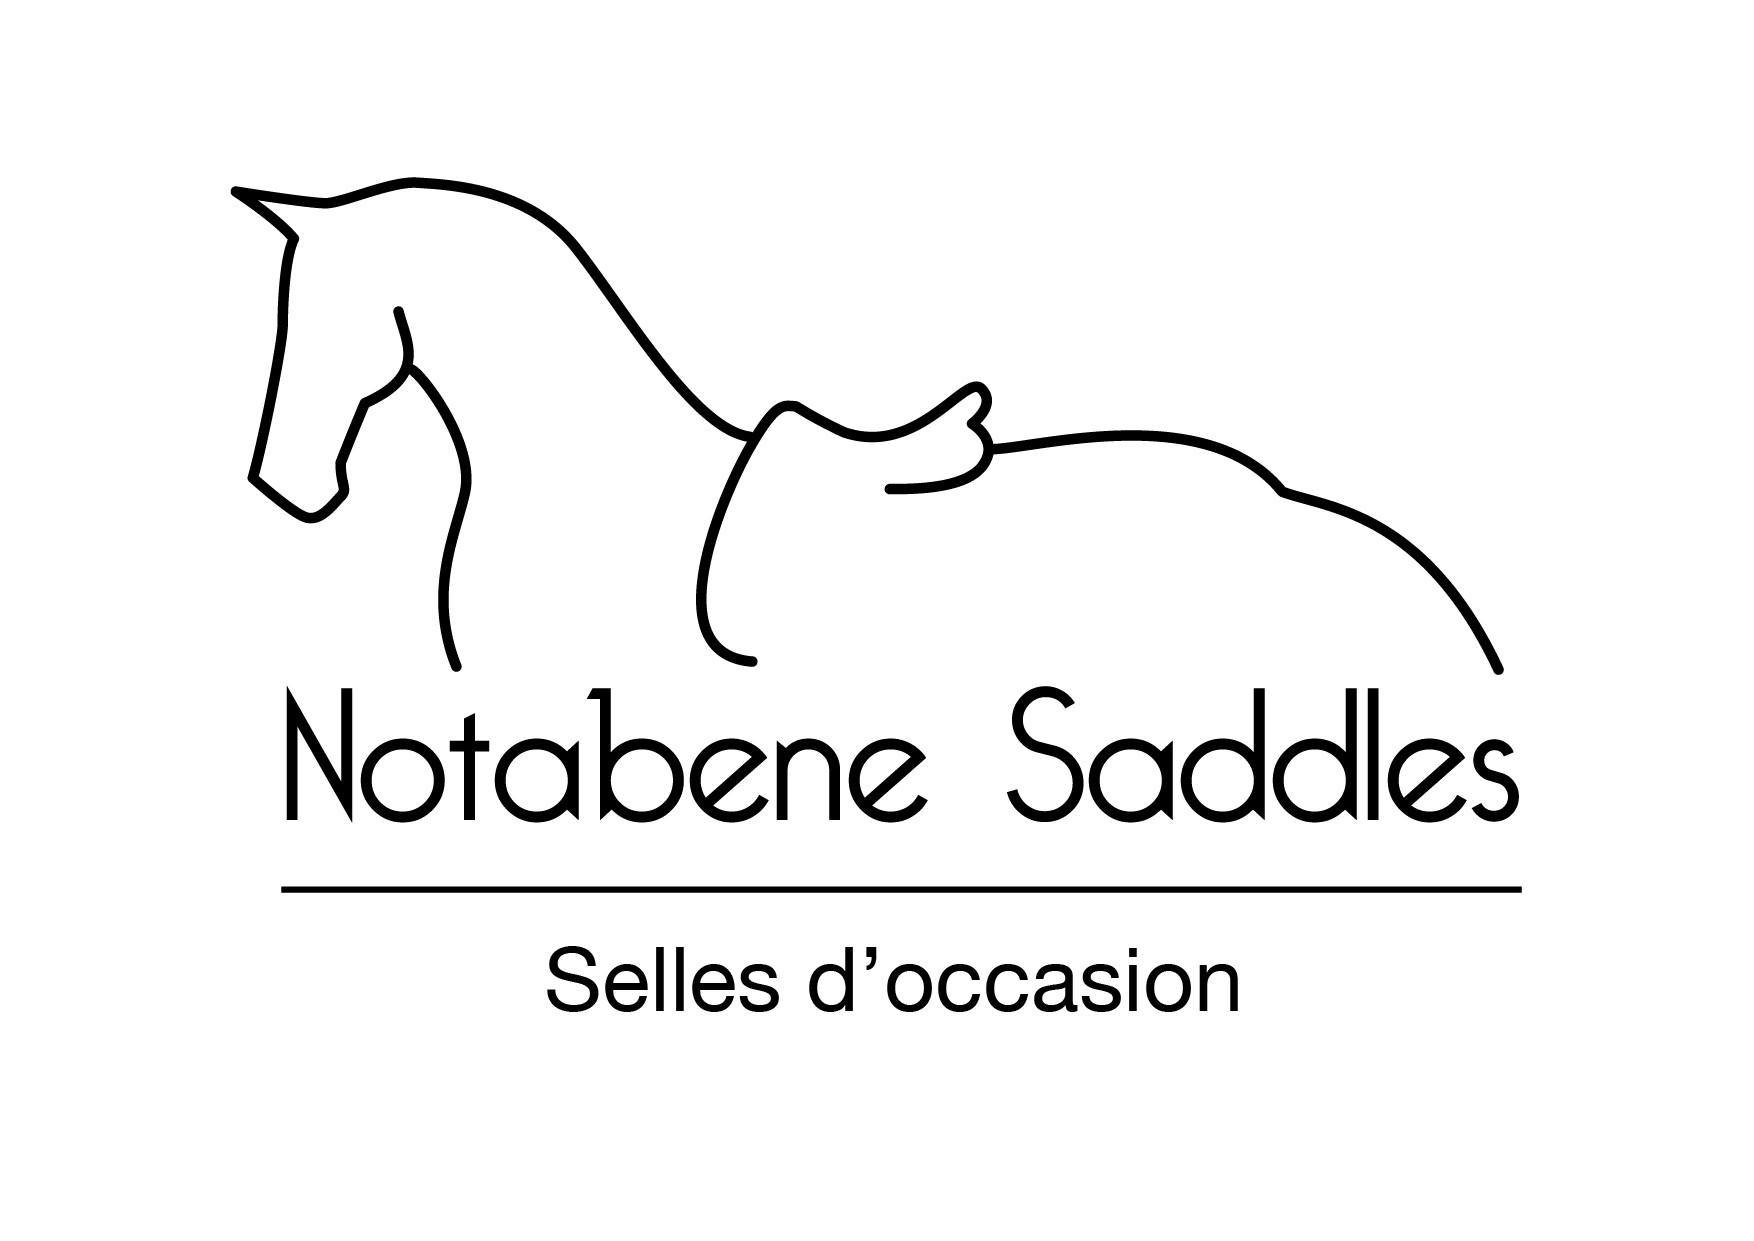 notabene-saddles